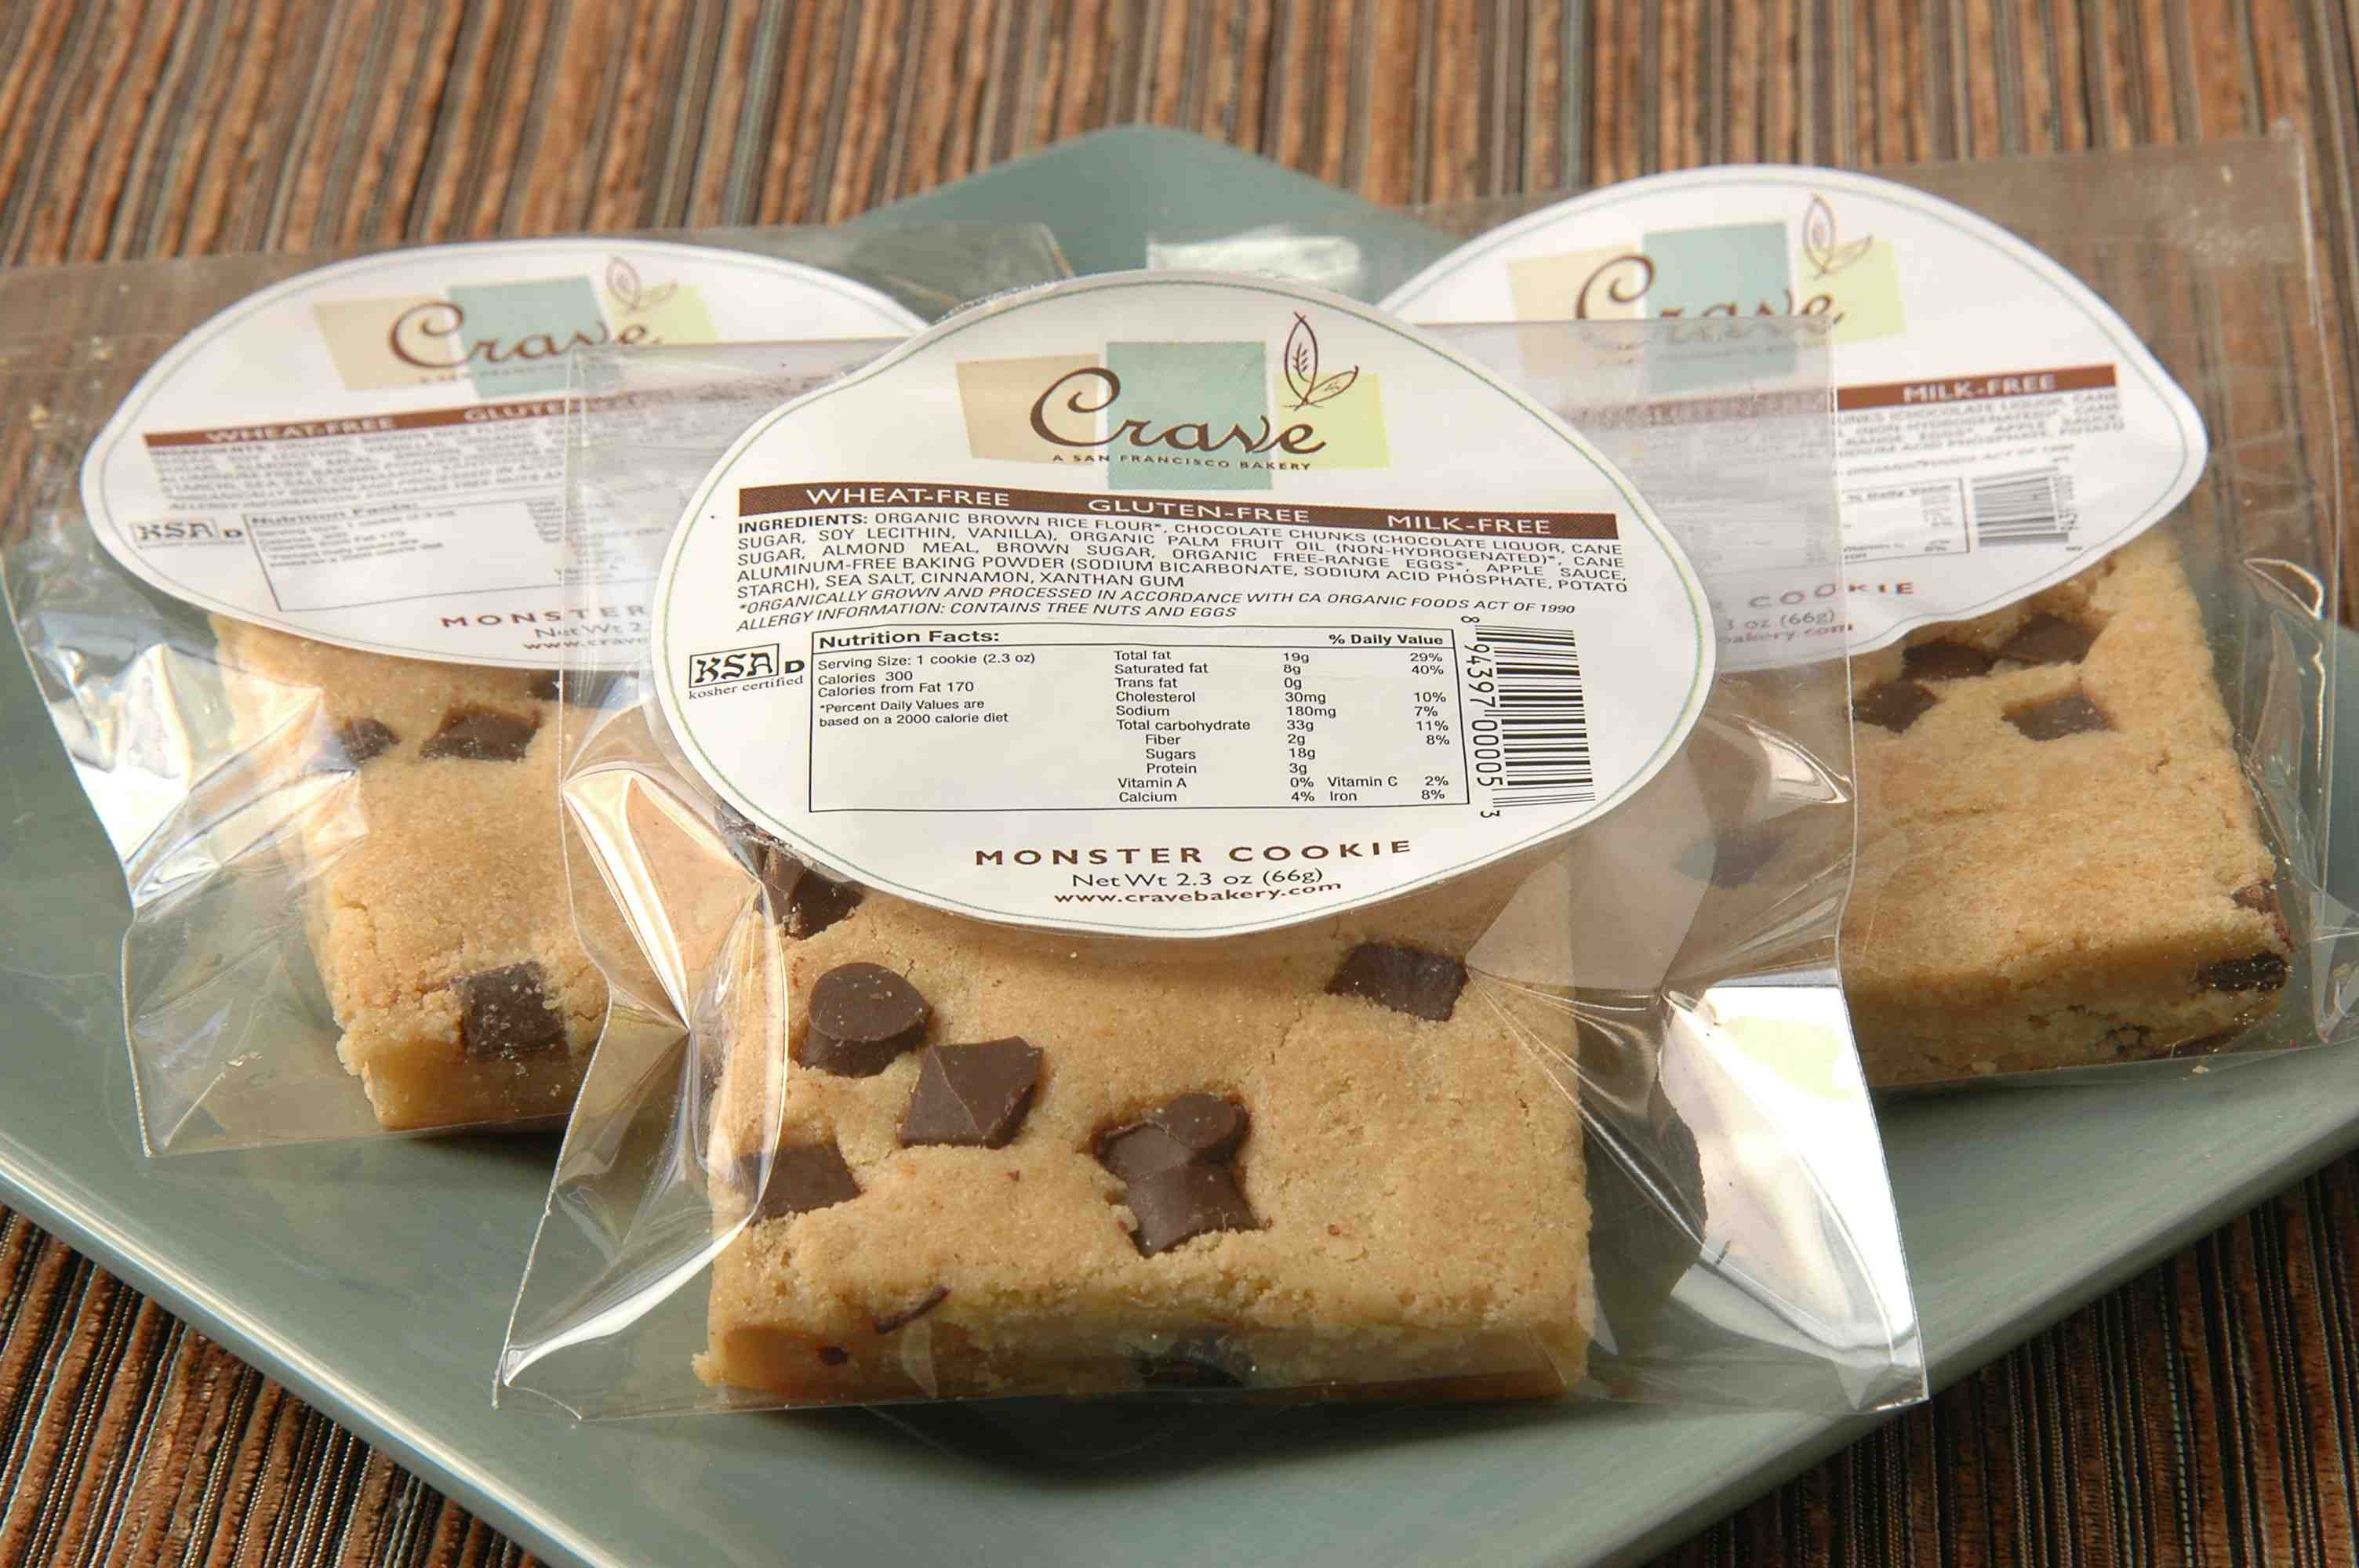 Terrific Crave A Very Fine Gluten Free Bakery Gluten Free Help Personalised Birthday Cards Arneslily Jamesorg